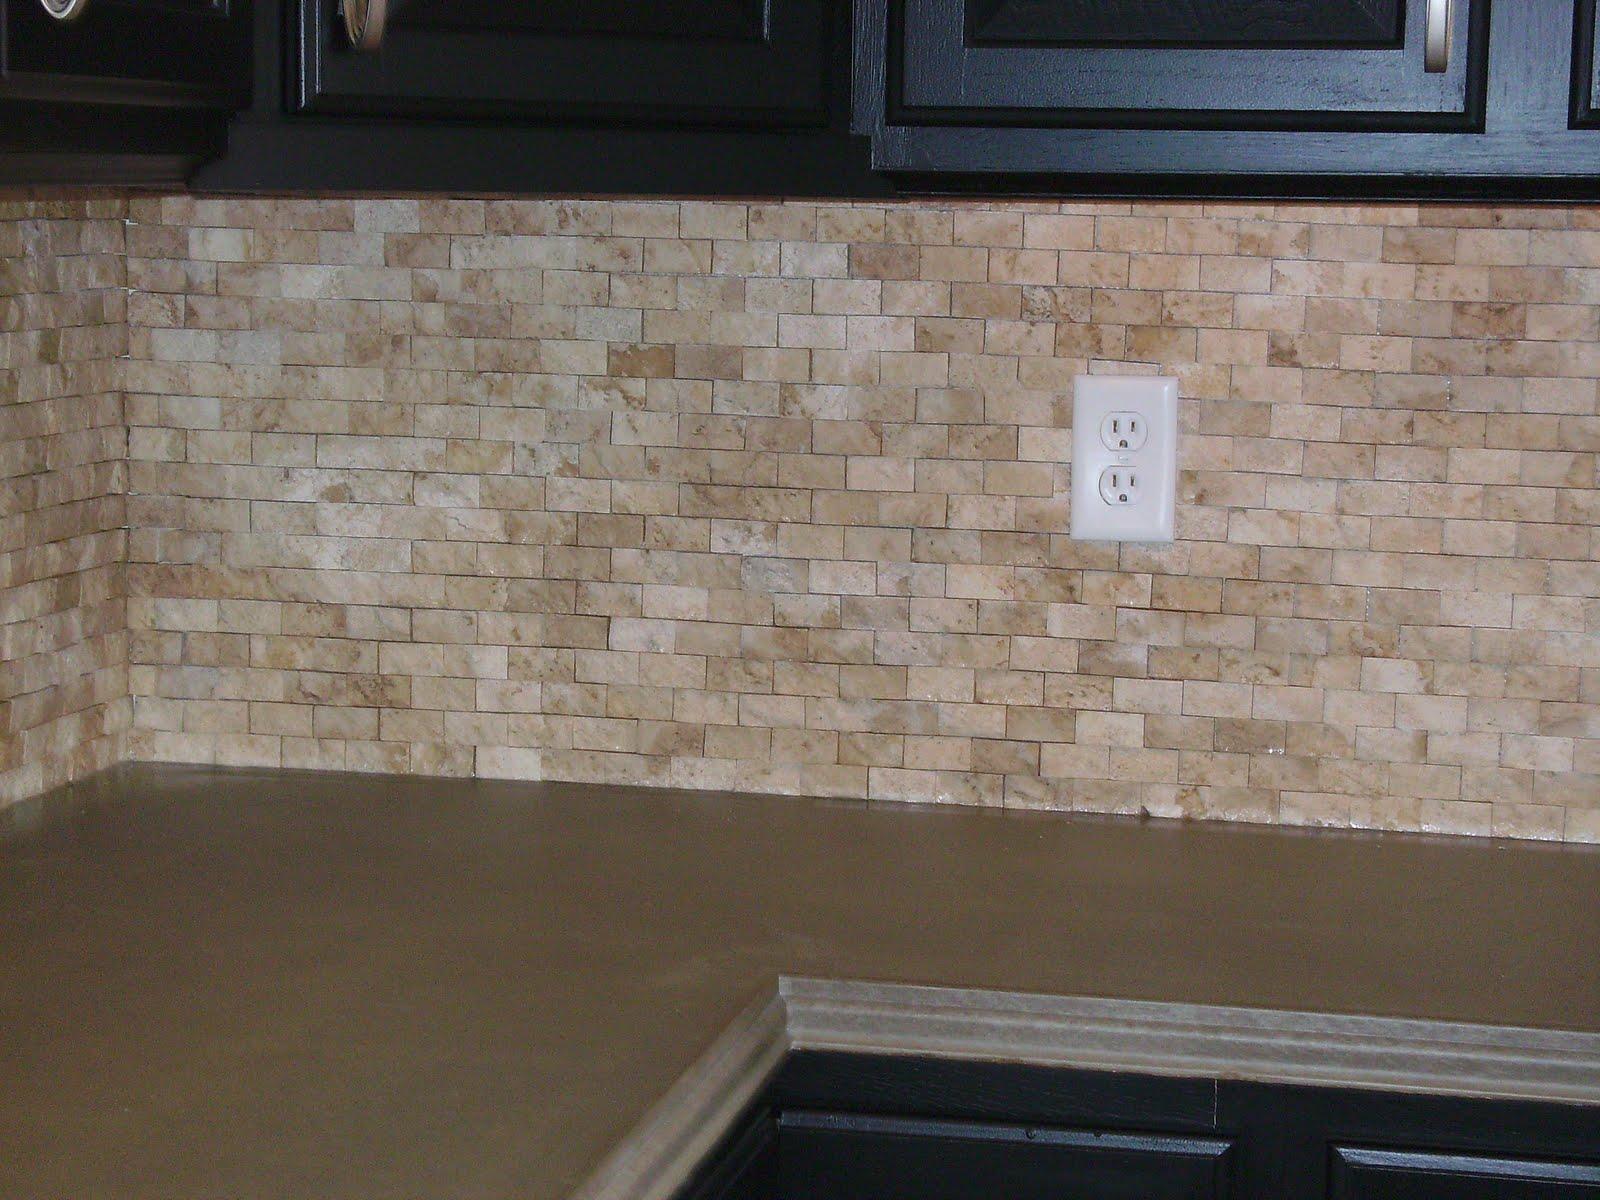 tile wallpaper backsplash stone backsplash kitchen Stone Wallpaper Backsplash Split faced stone backsplash